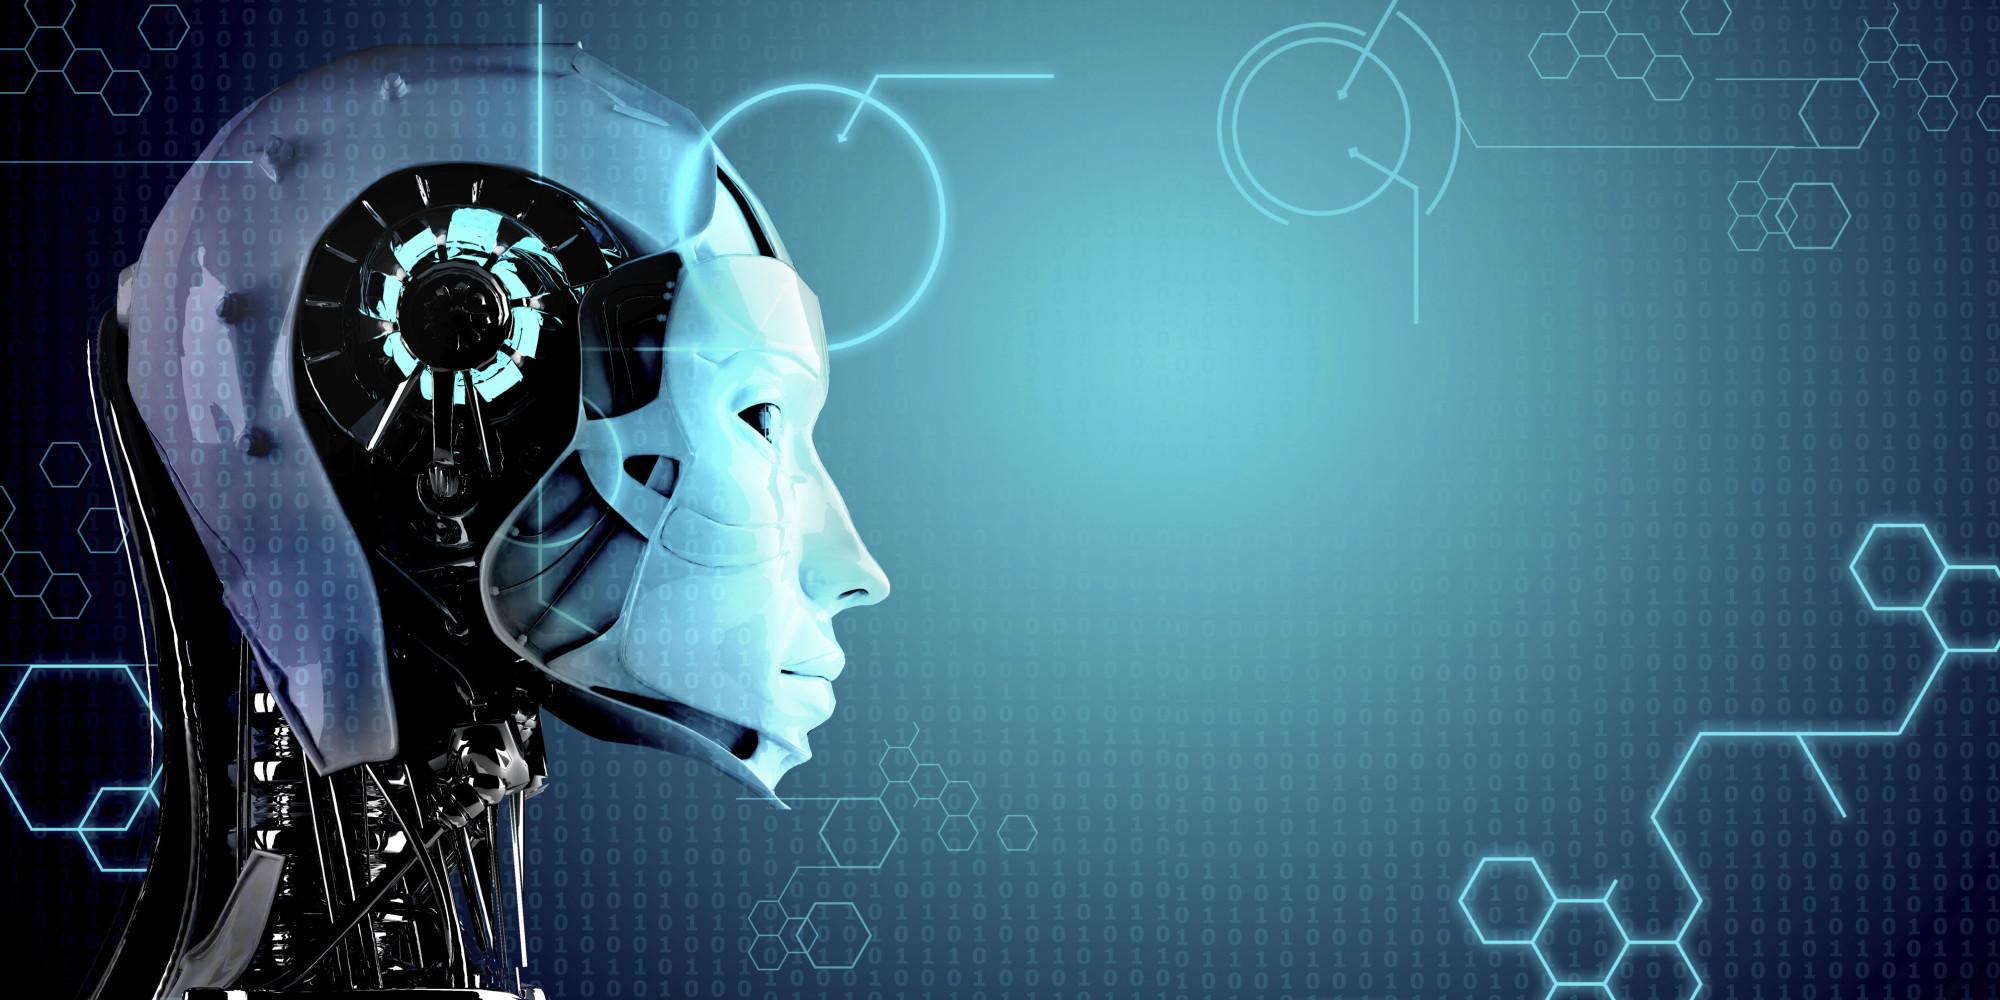 robot women in technology background